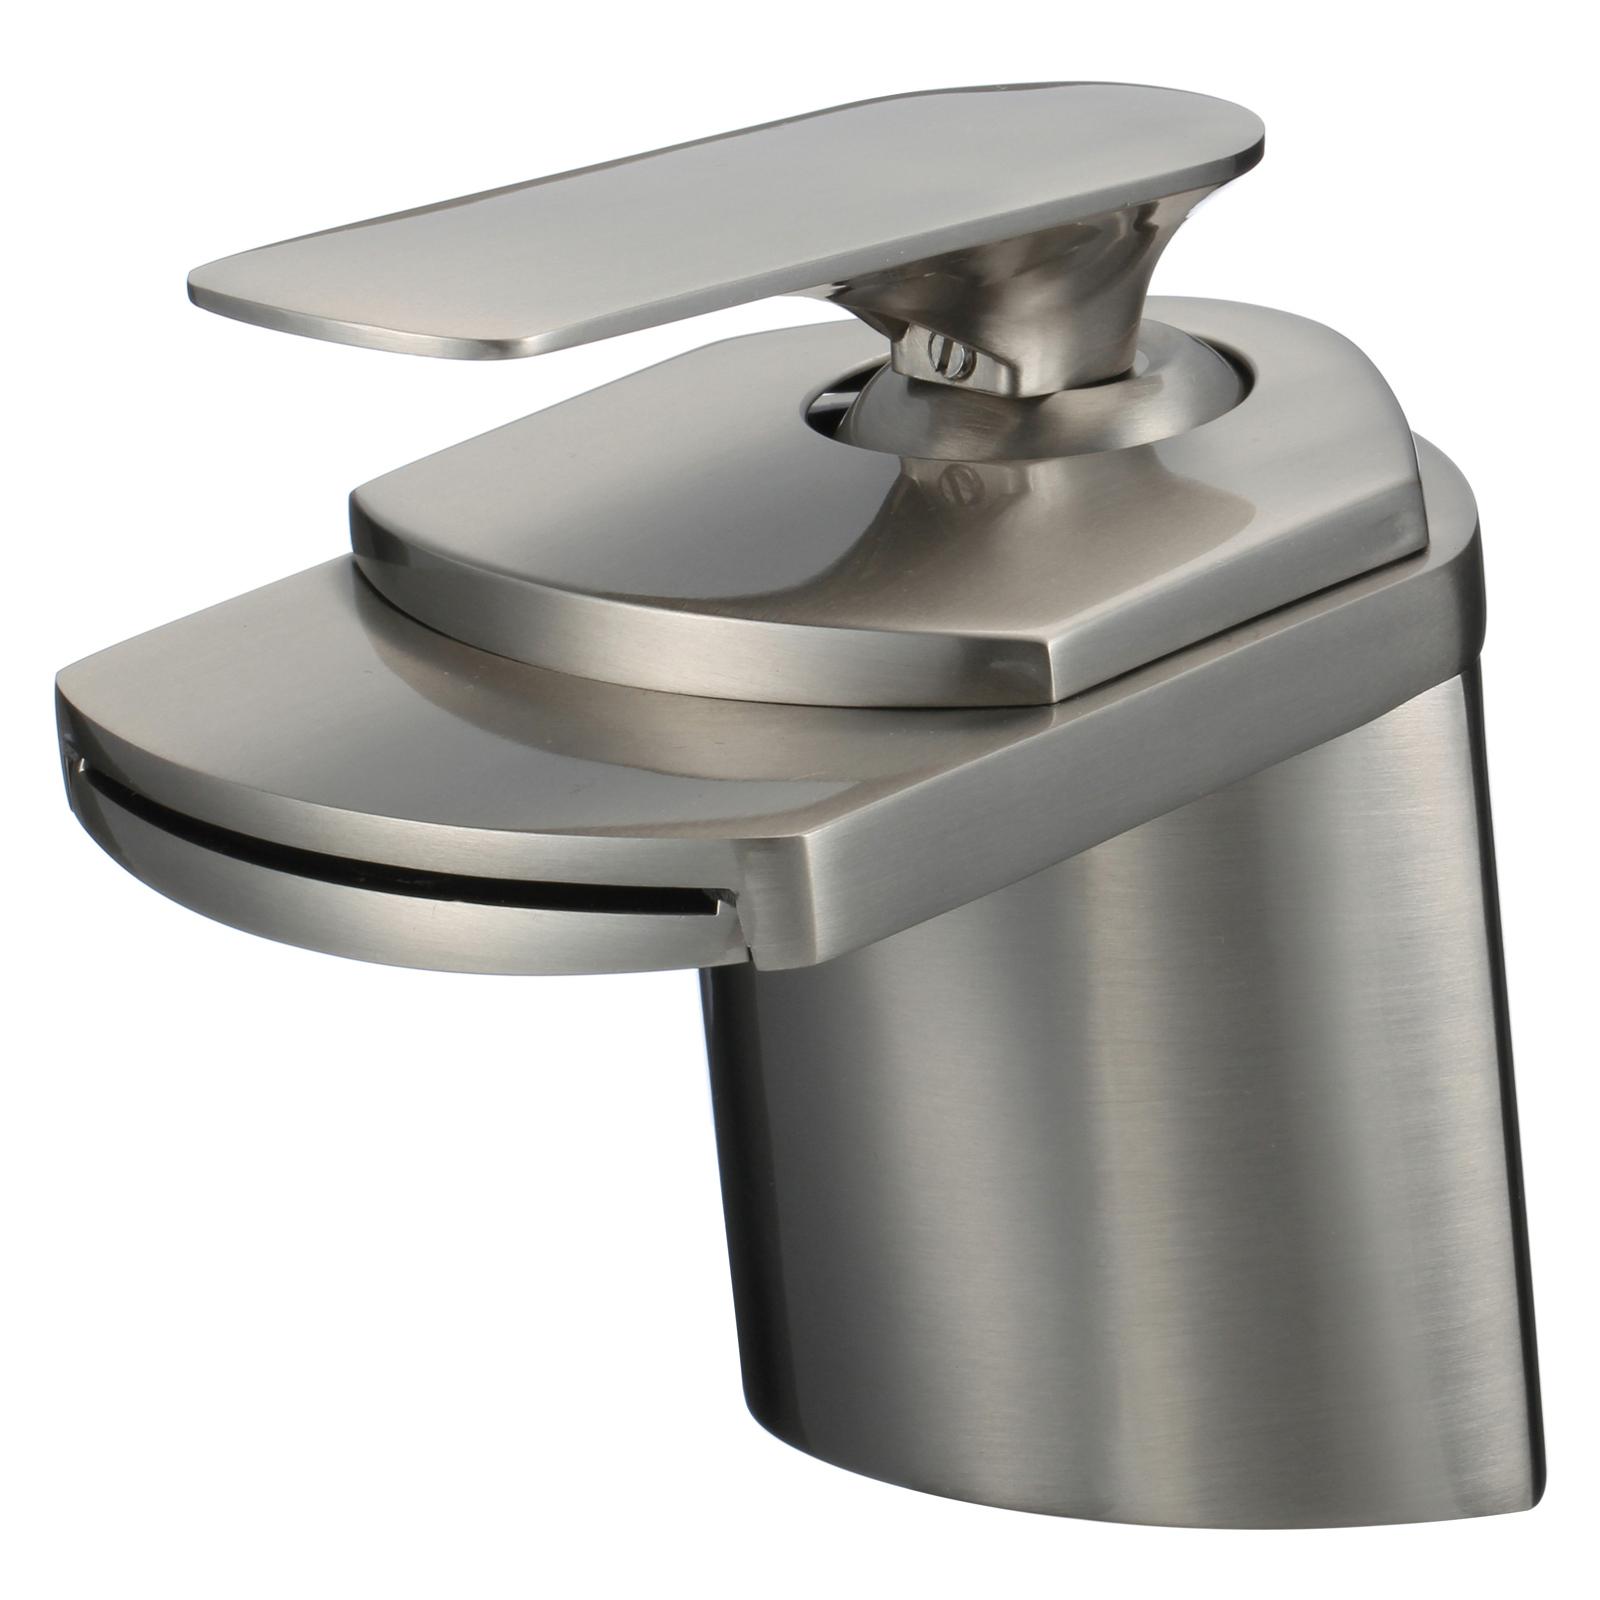 "6"" Modern Bathroom Sink Faucet - Single Hole / Handle"